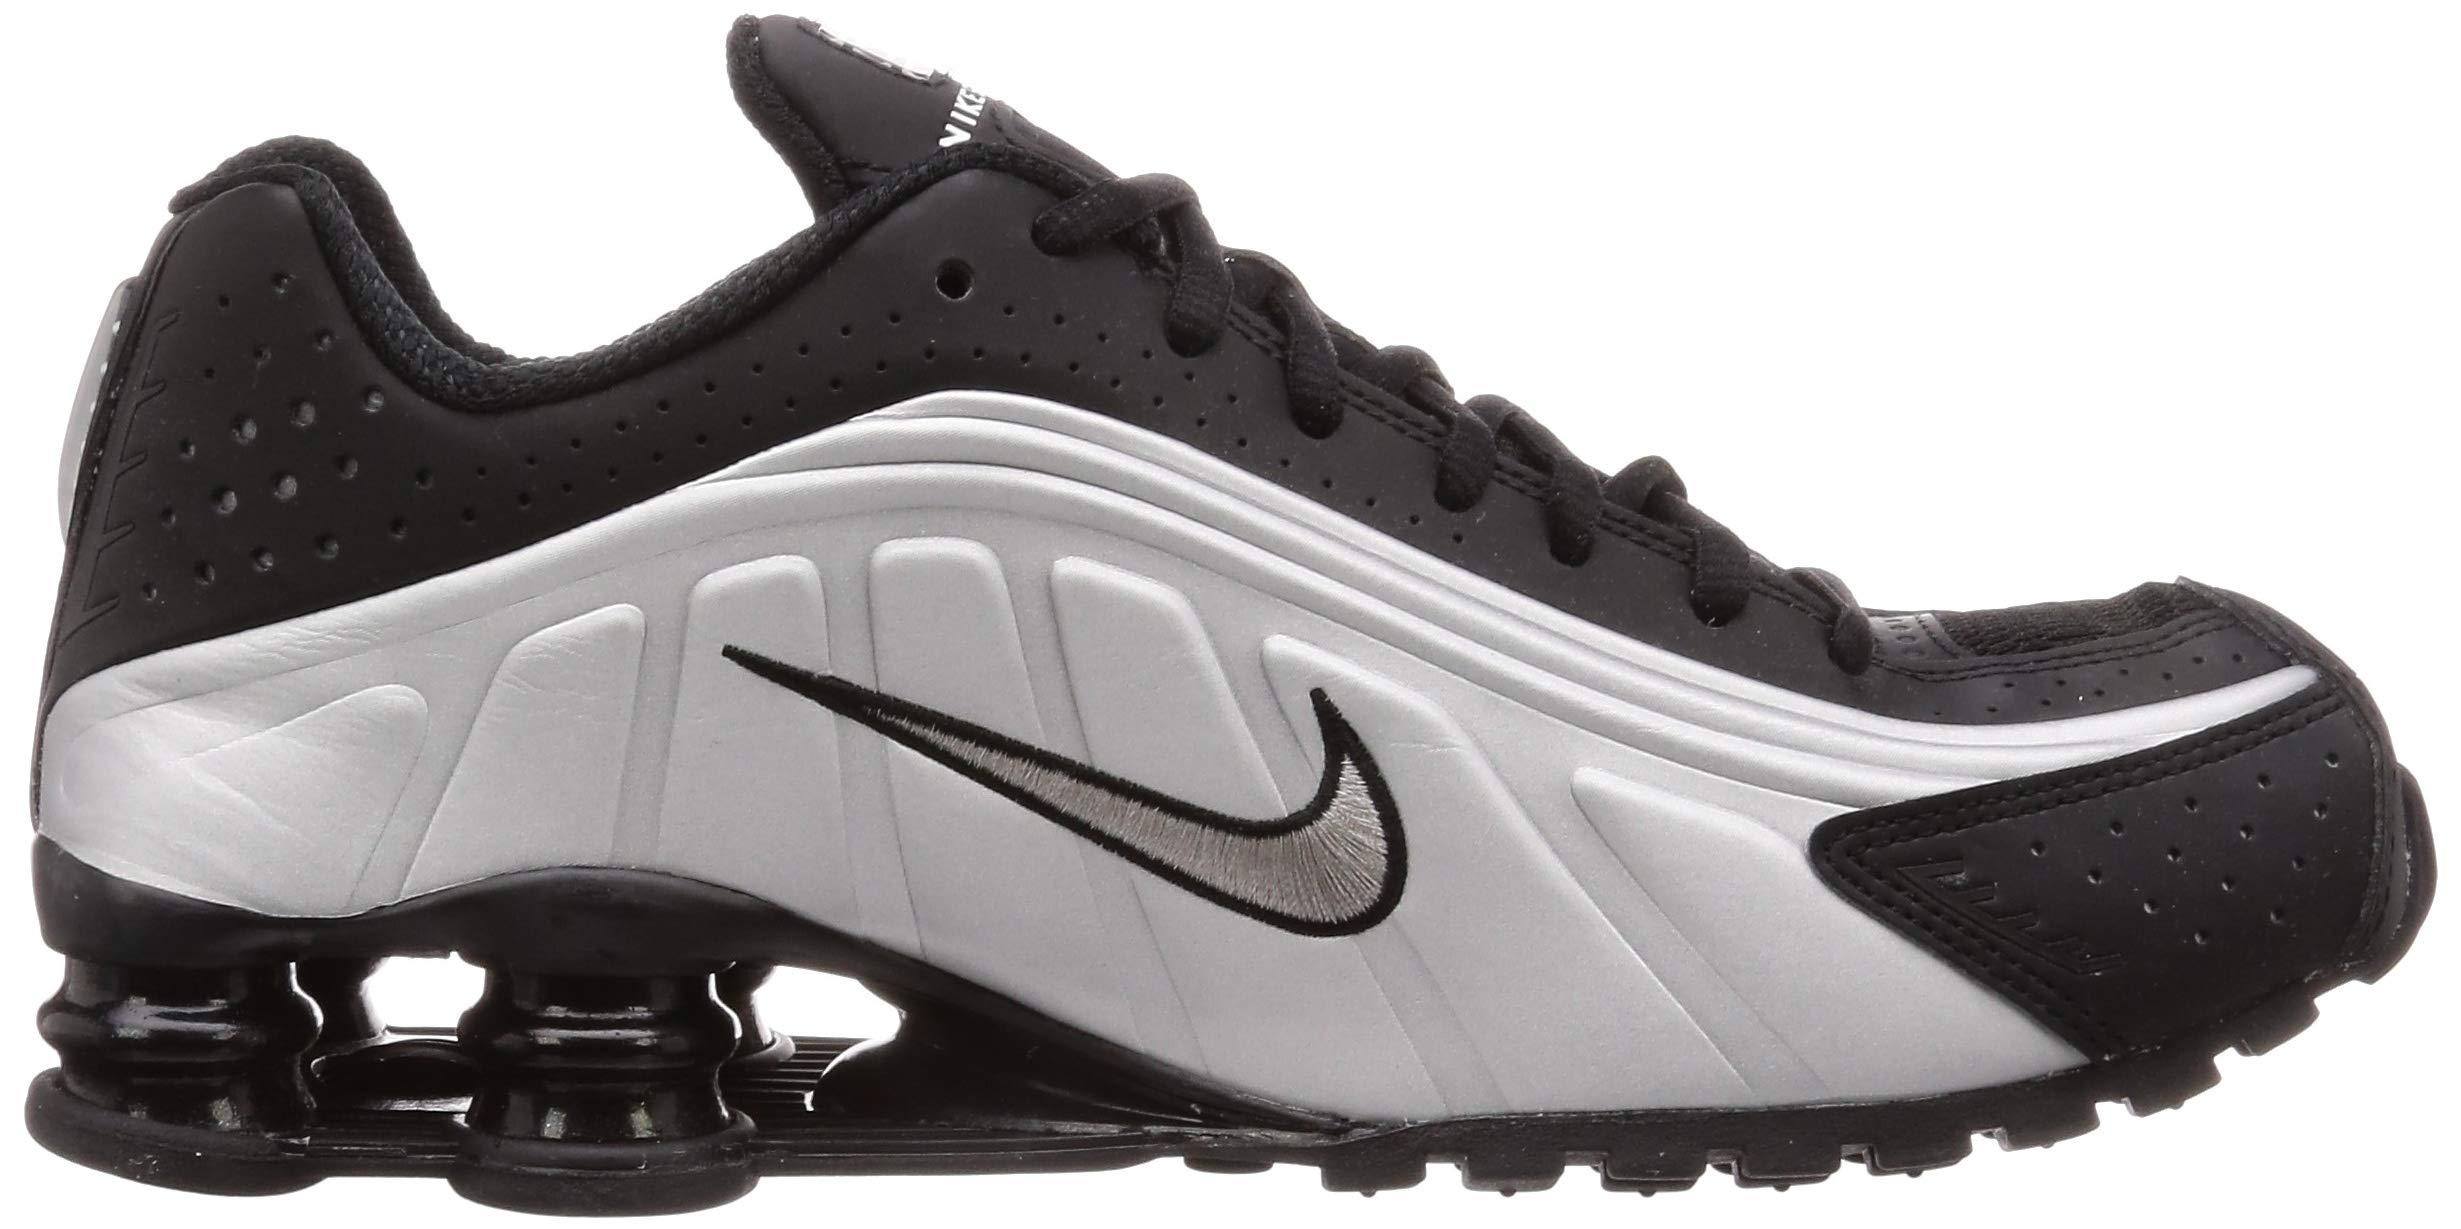 Details about Nike Mens Shox R4 (Black/Black-Metallic Silver